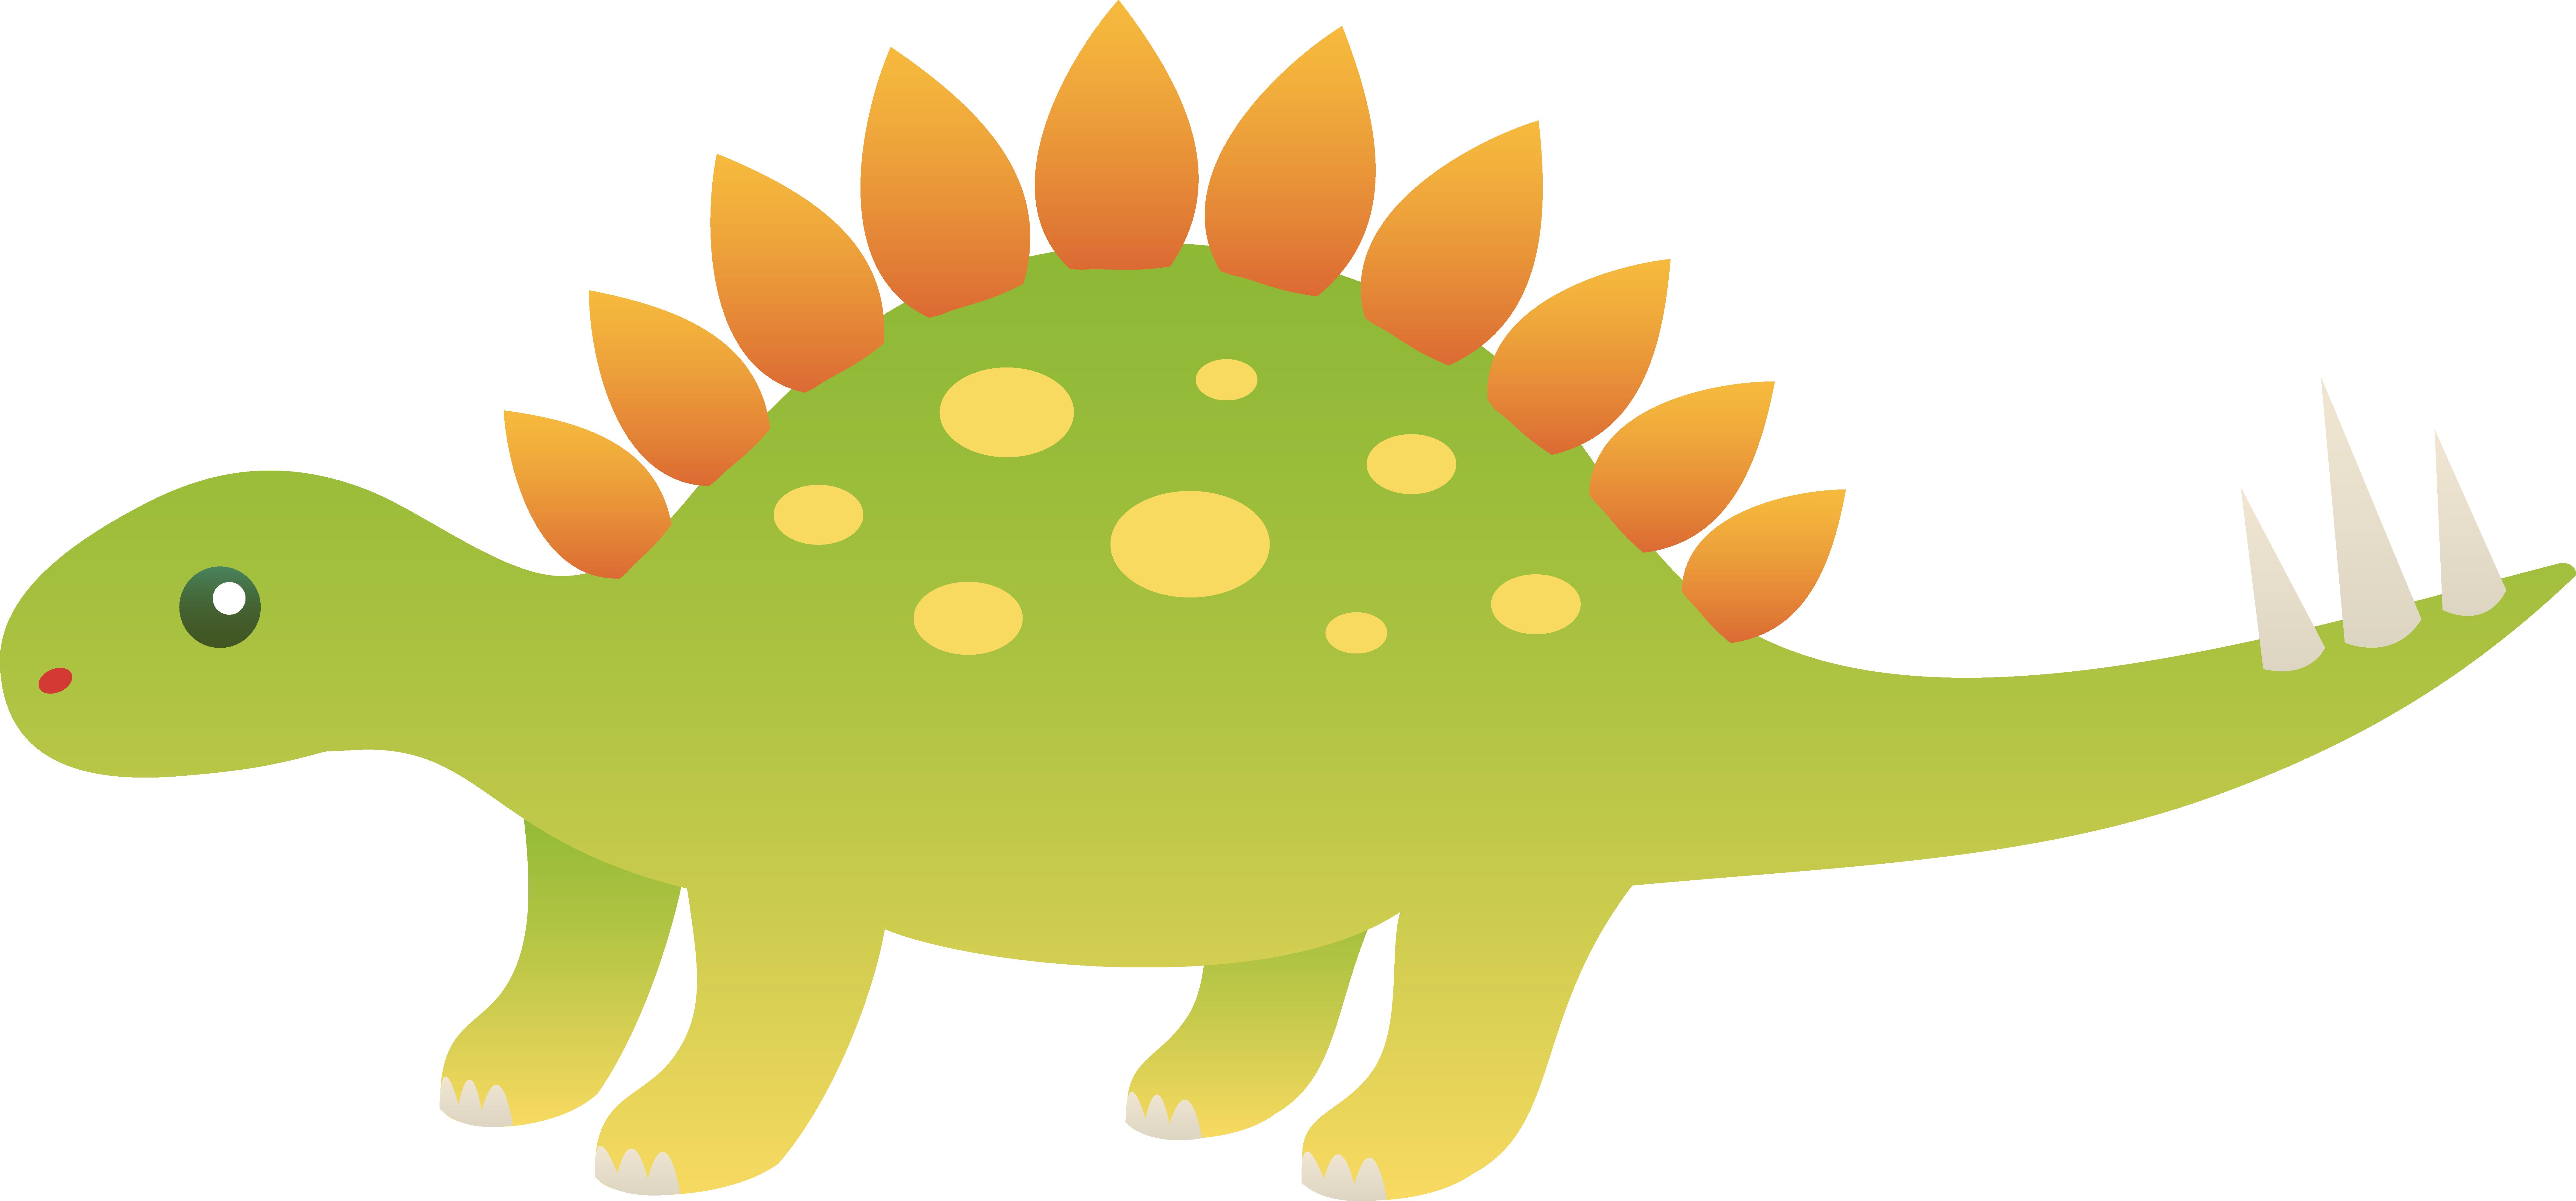 Cute Stegosaurus Dinosaur.